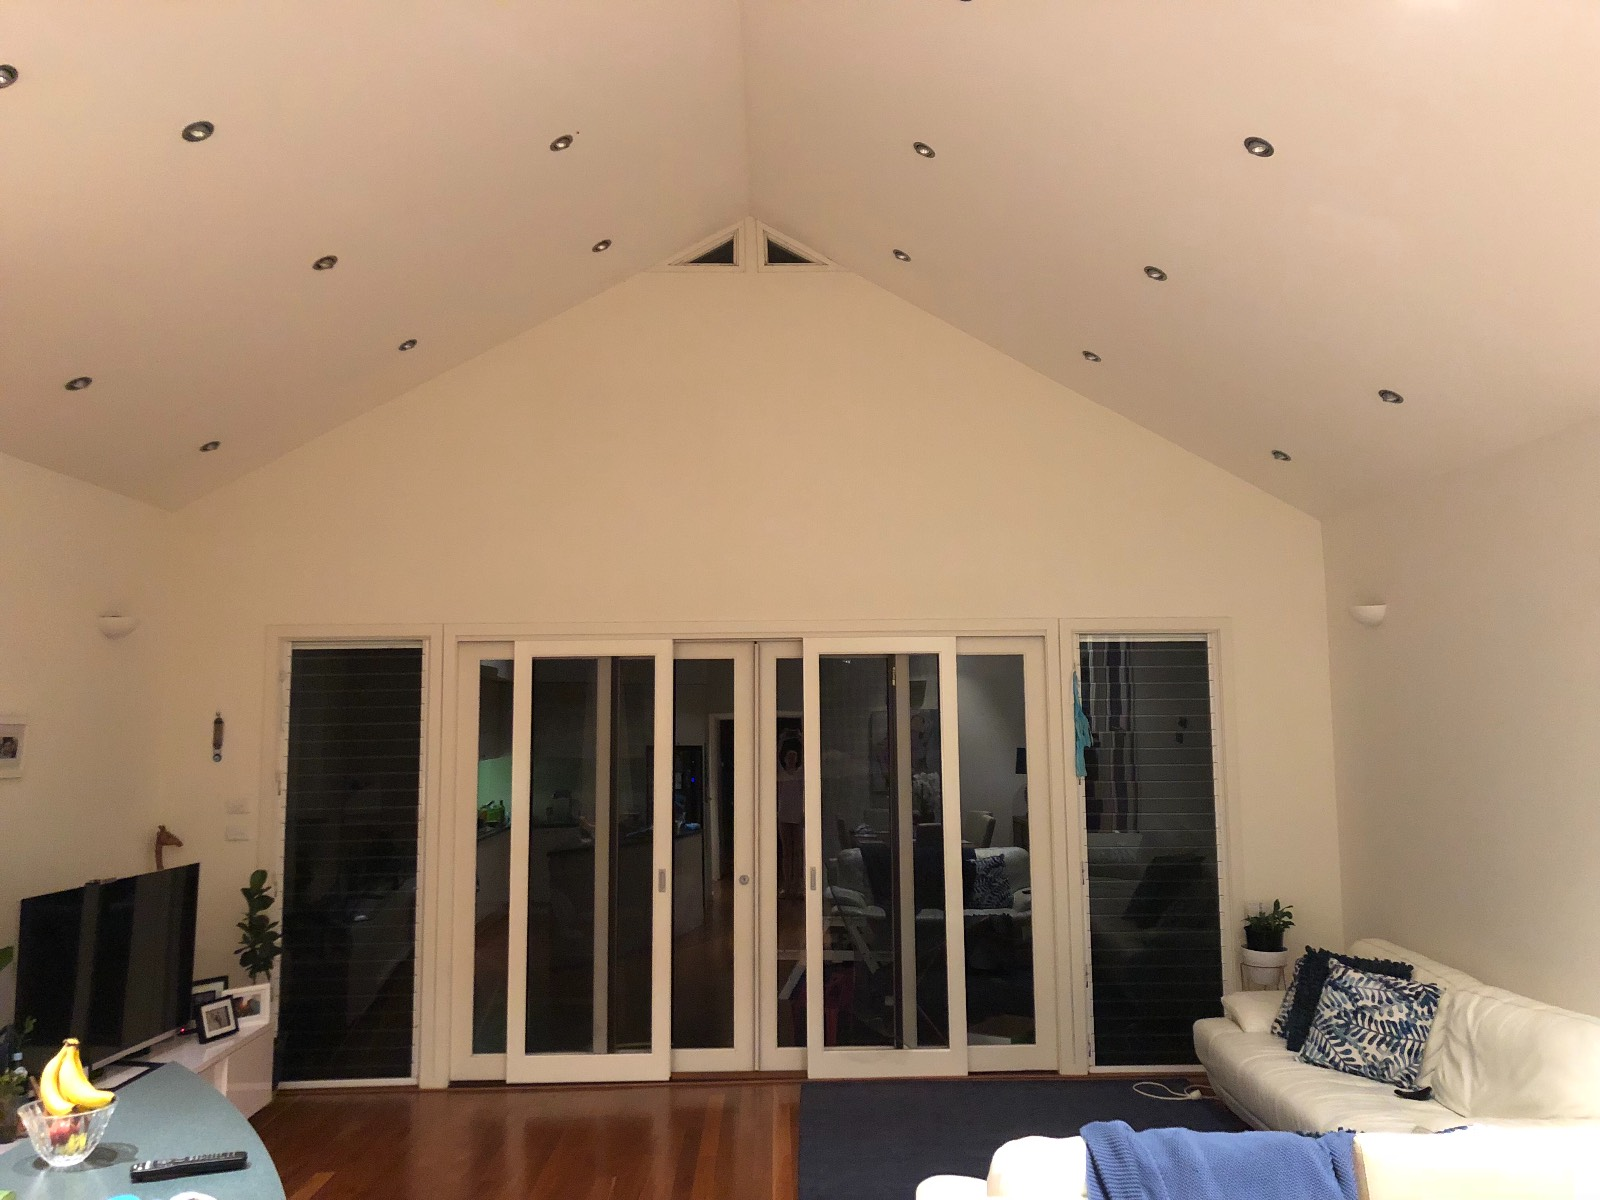 Design my lounge room please!